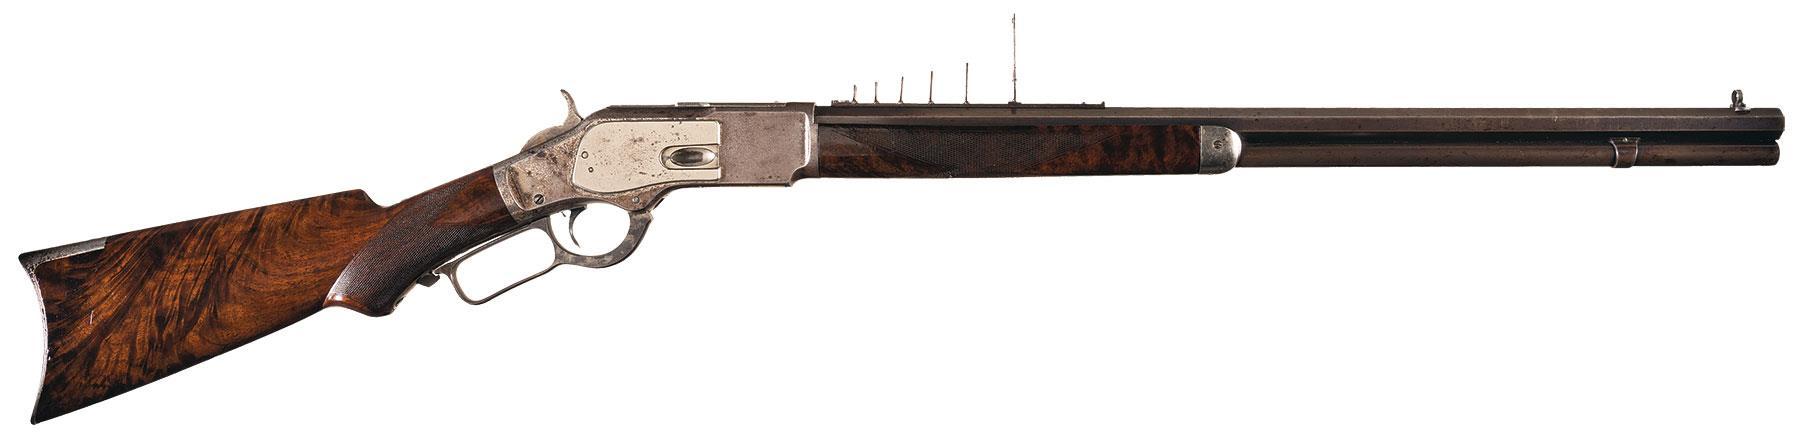 Four Antique American Cartridge Revolvers